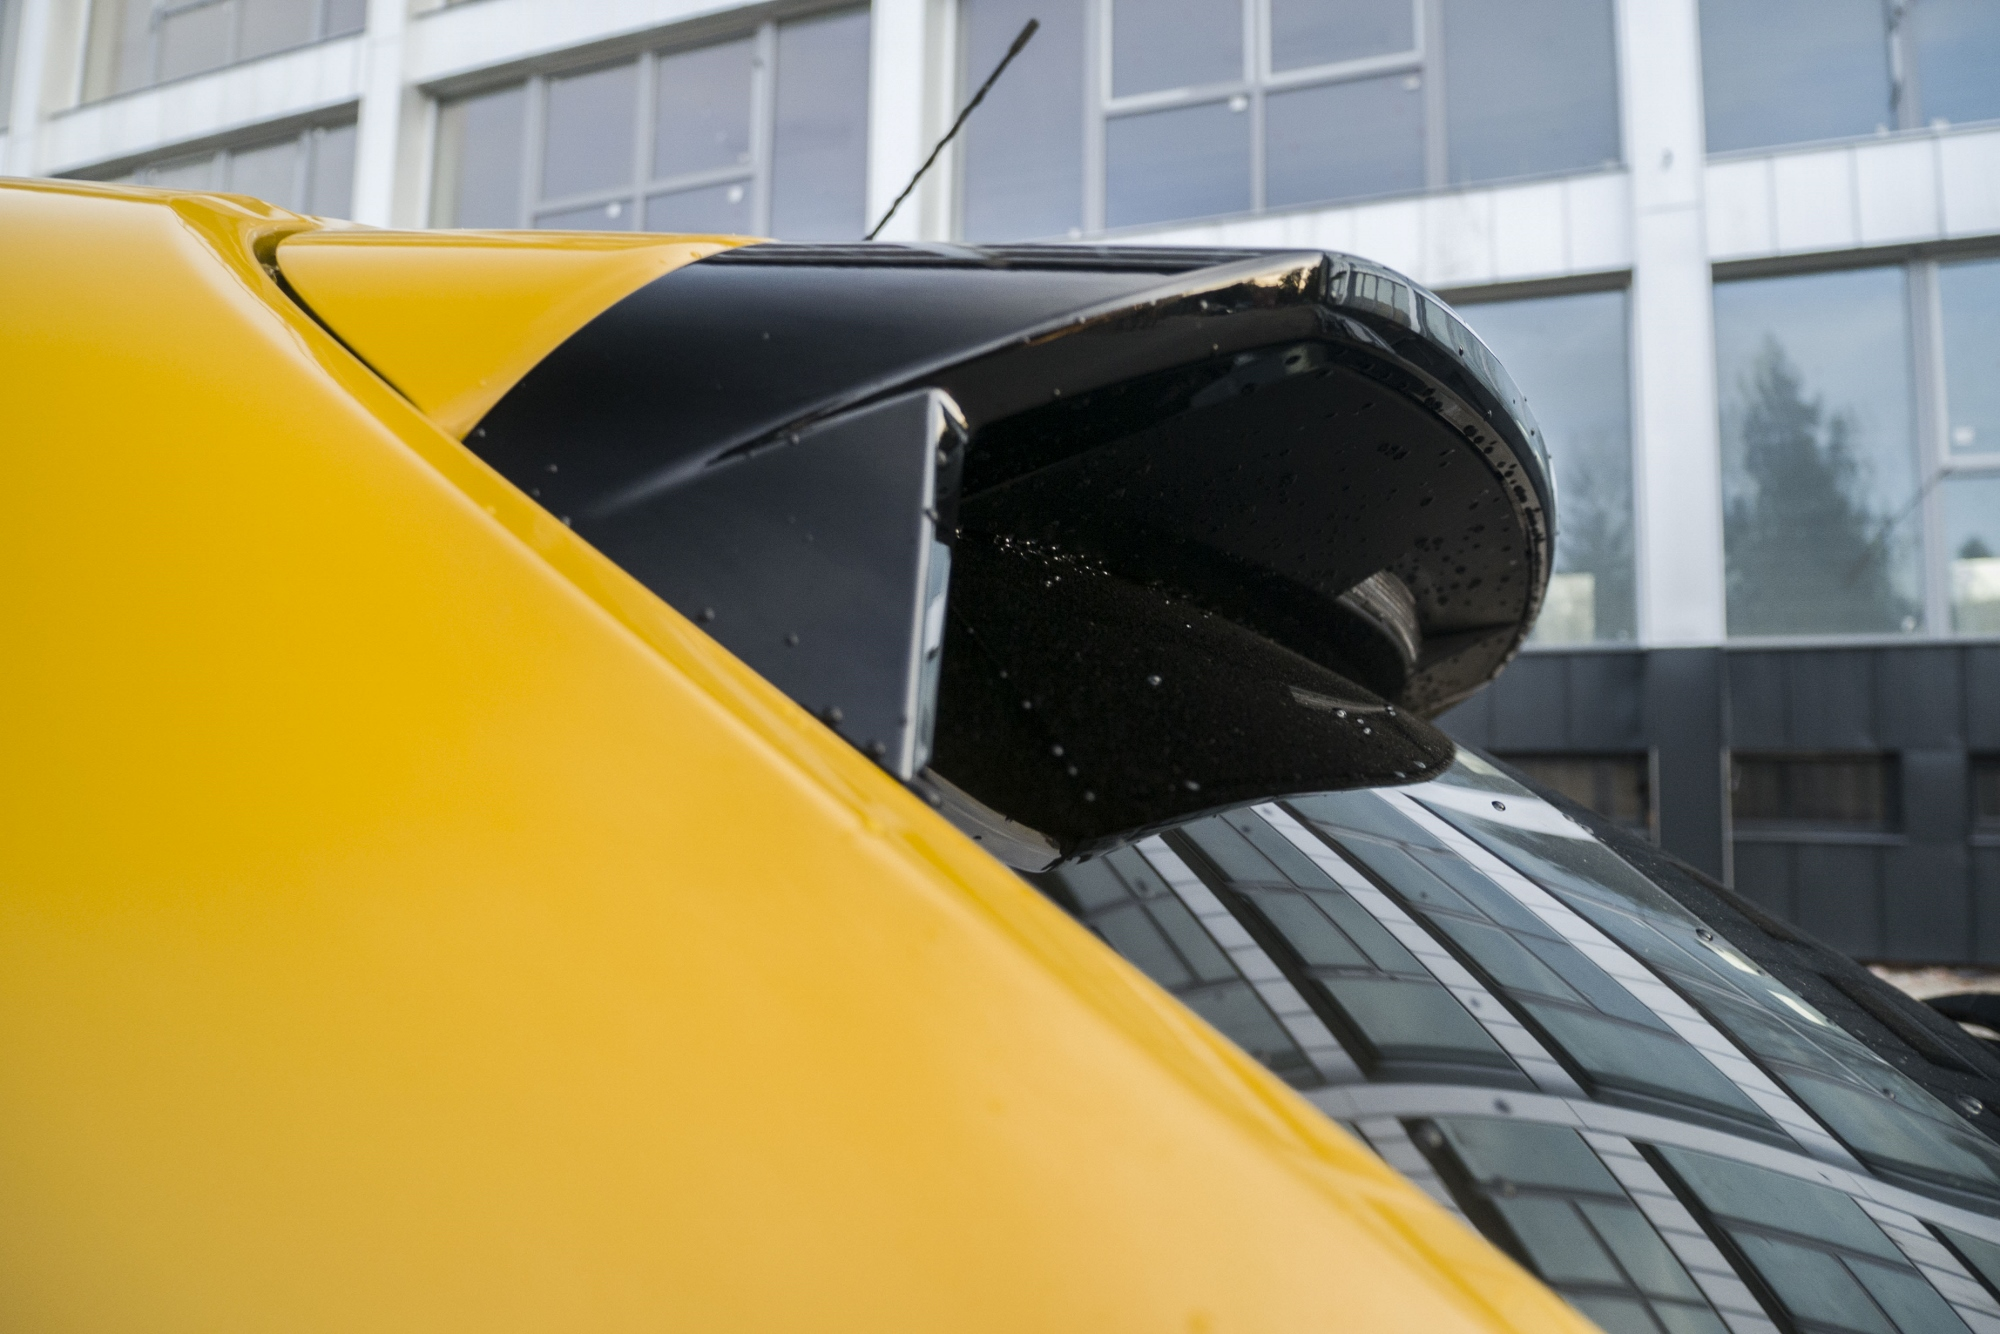 Test: Peugeot 208 prekvapivo pútal pohľady 2PegljjKVu peugeot-208-19